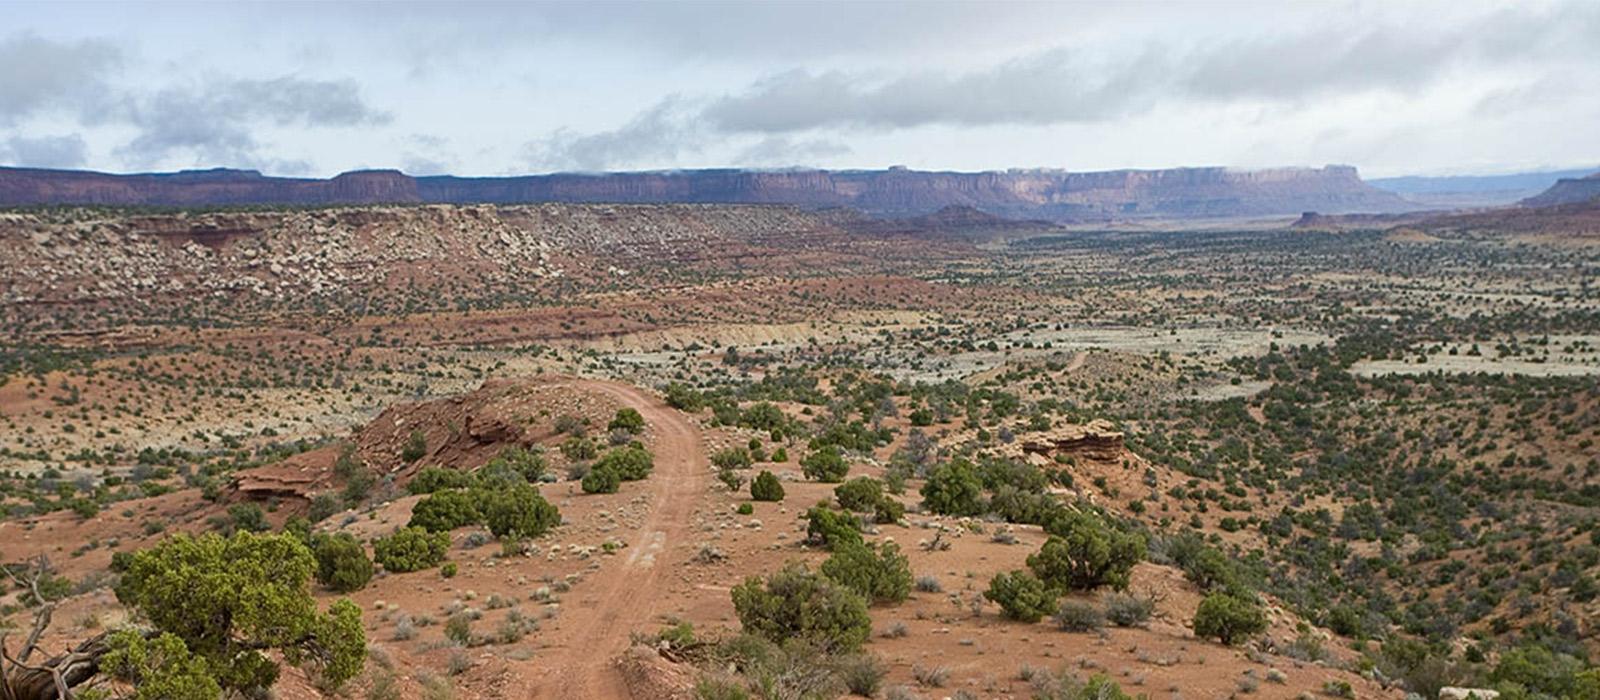 Big desert scenery.